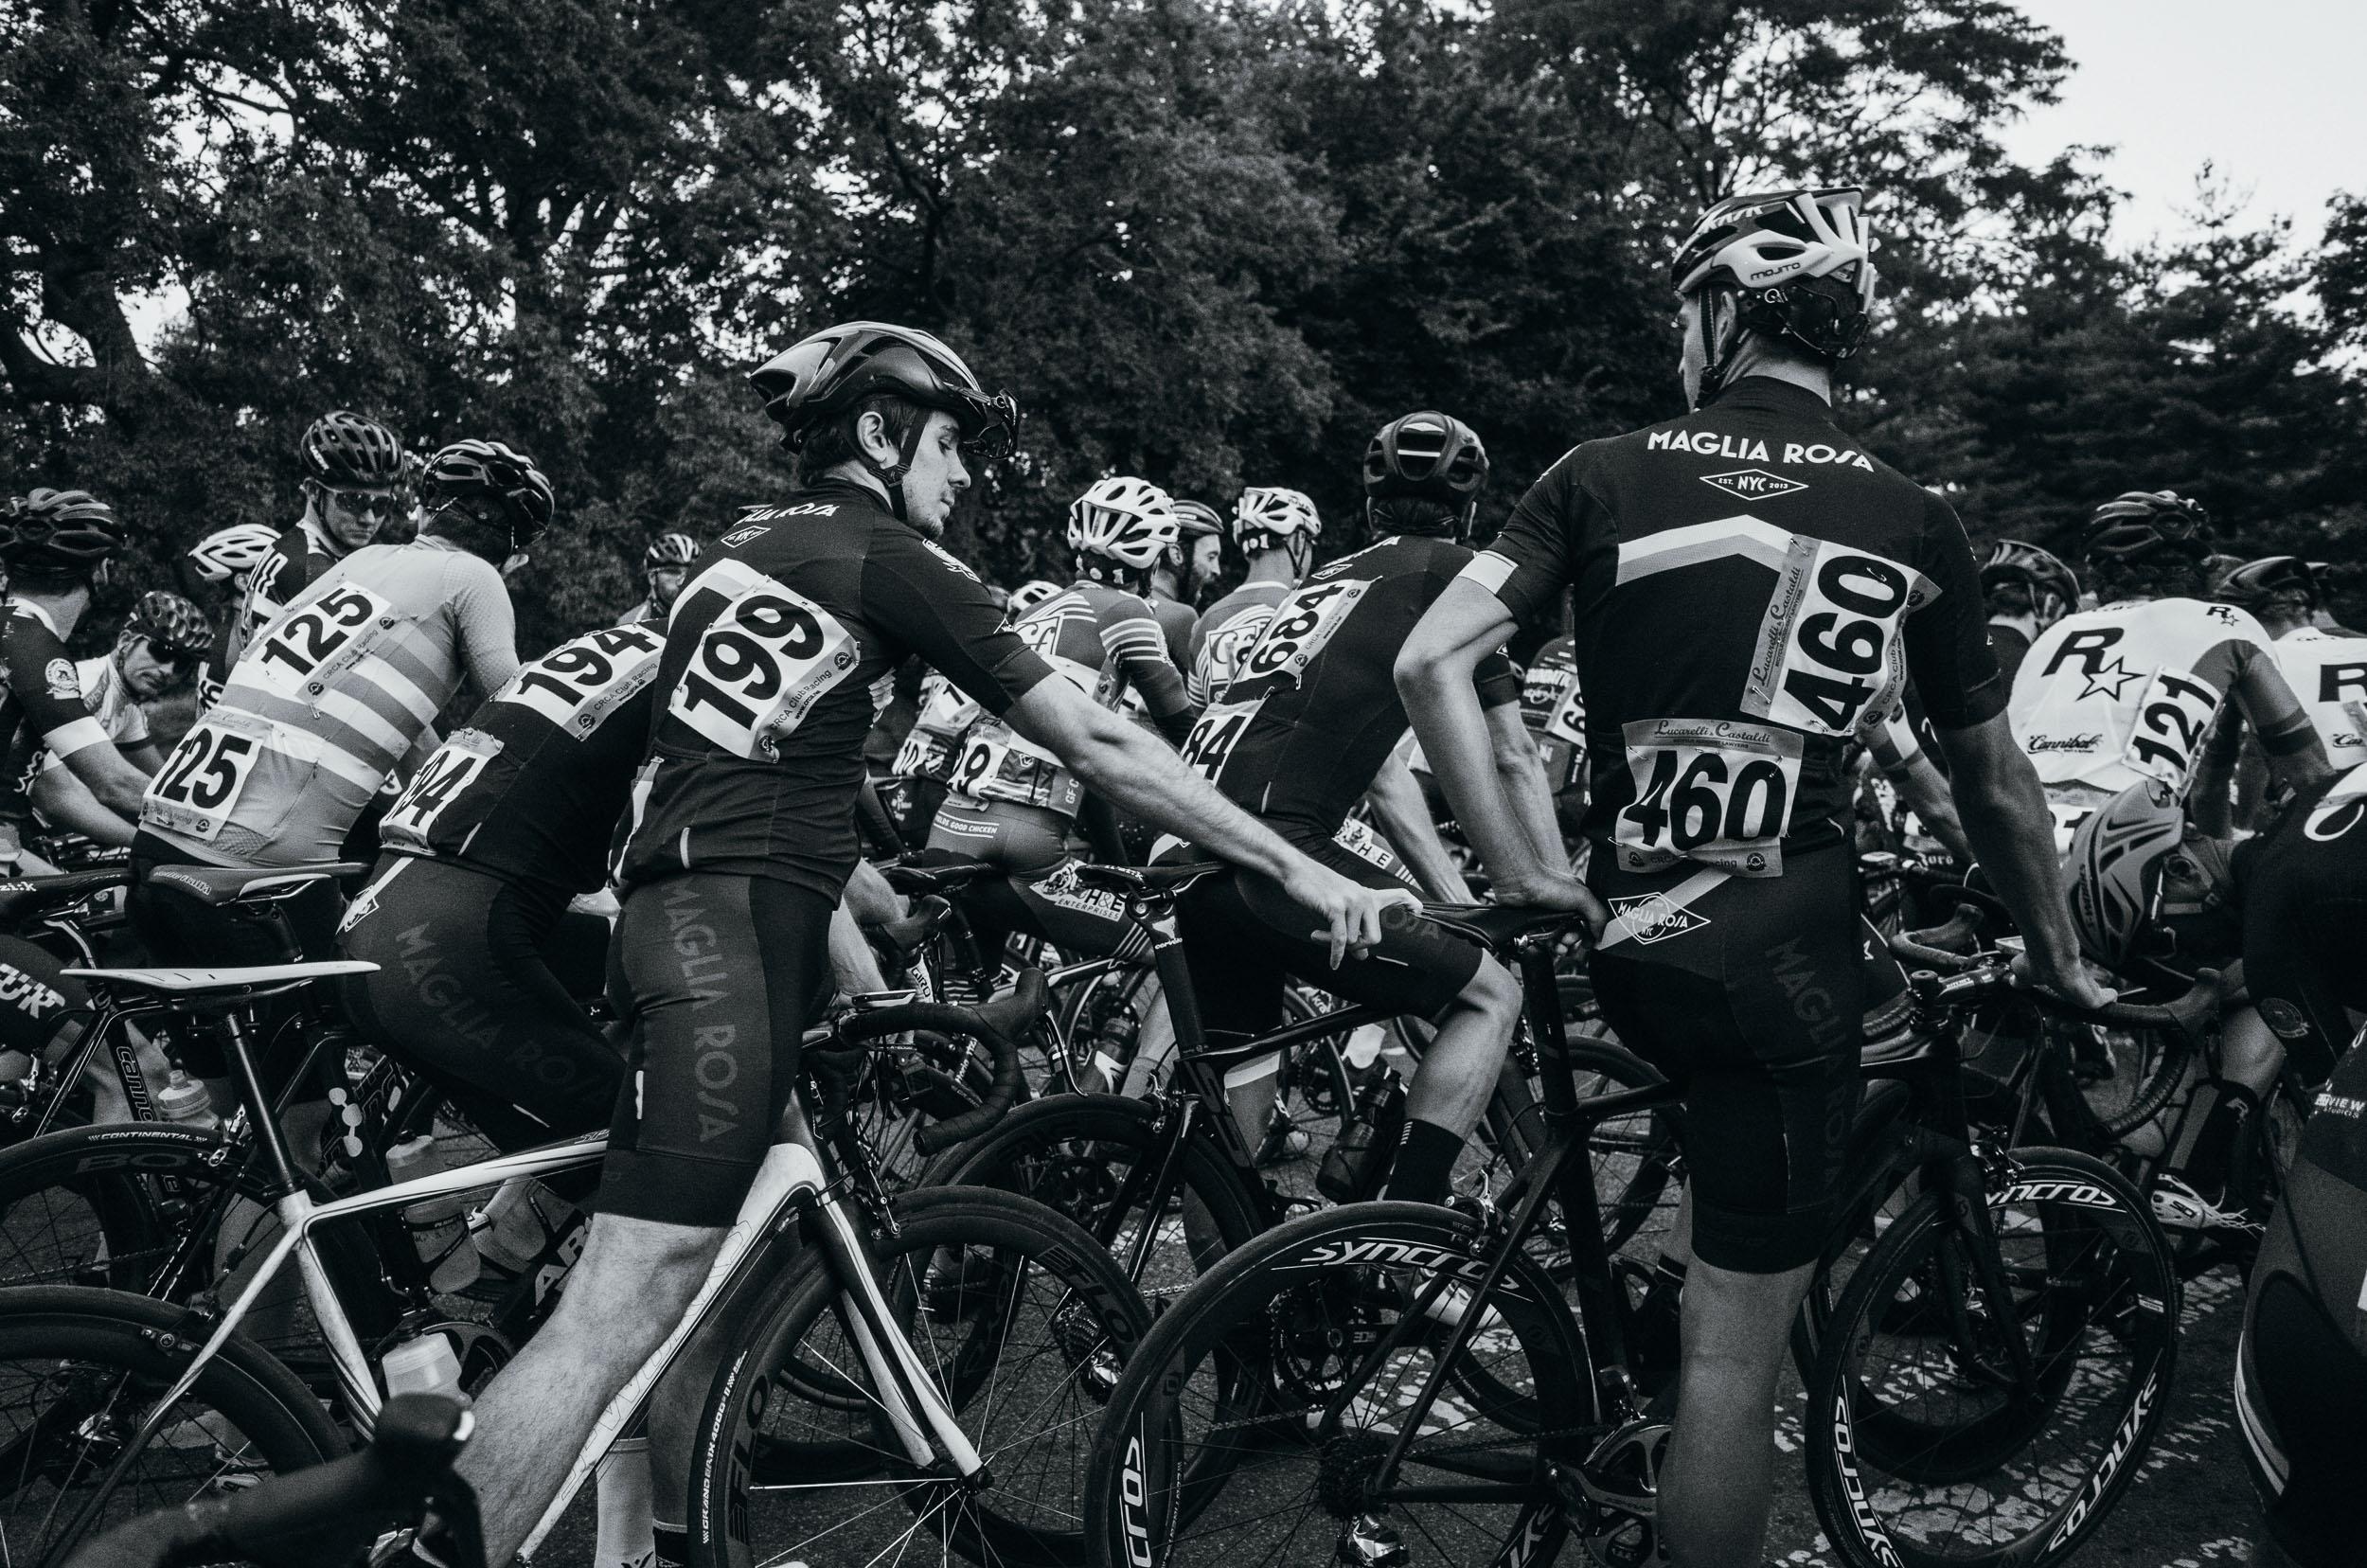 photo-rhetoric-to-be-determined-crca-club-race-119.jpg